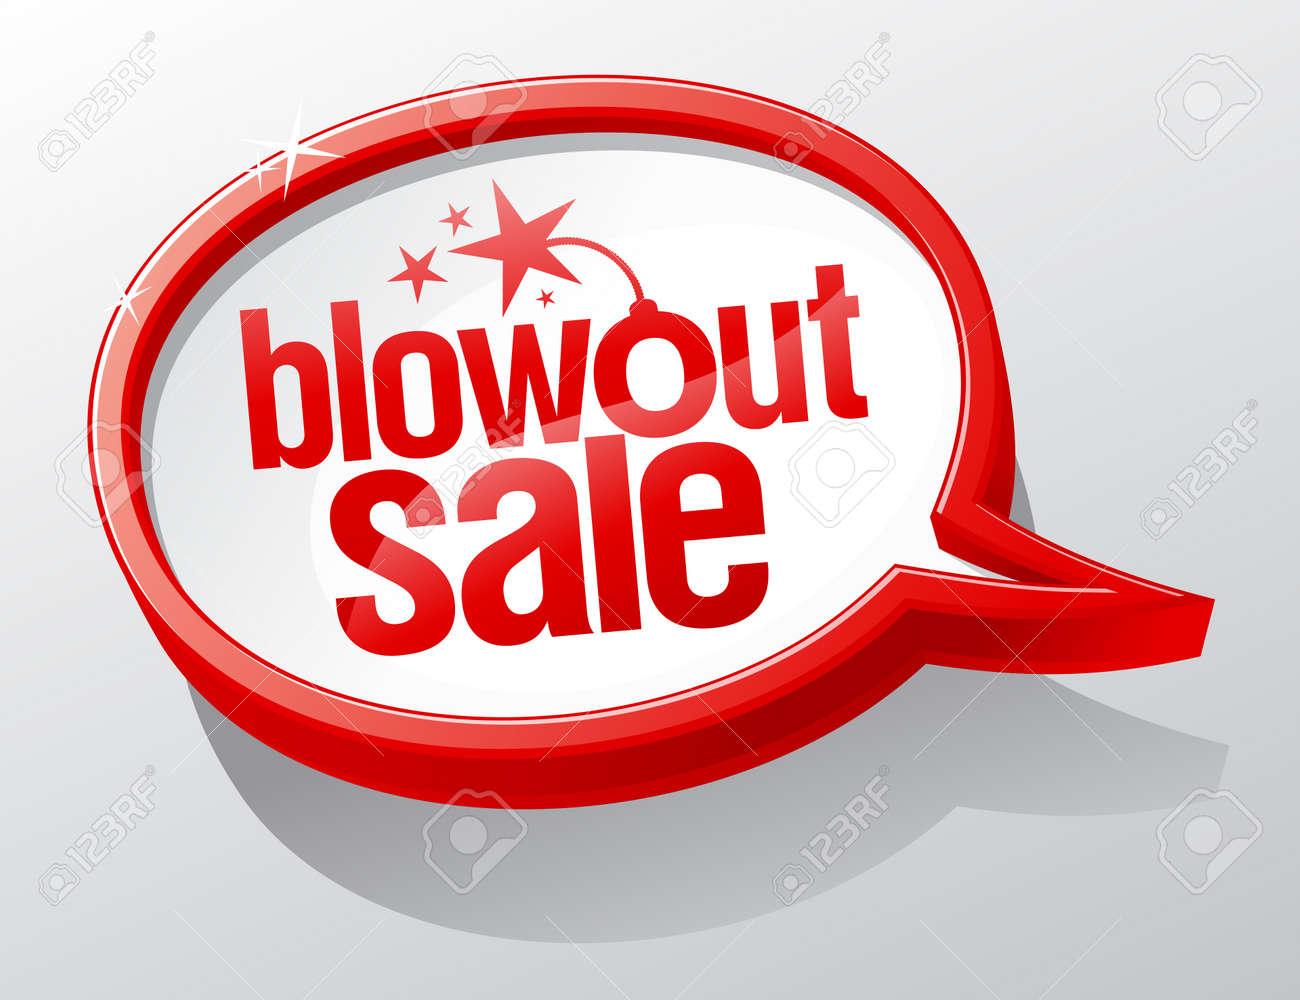 Blowout sale shiny glass speech bubble Stock Vector - 19755413